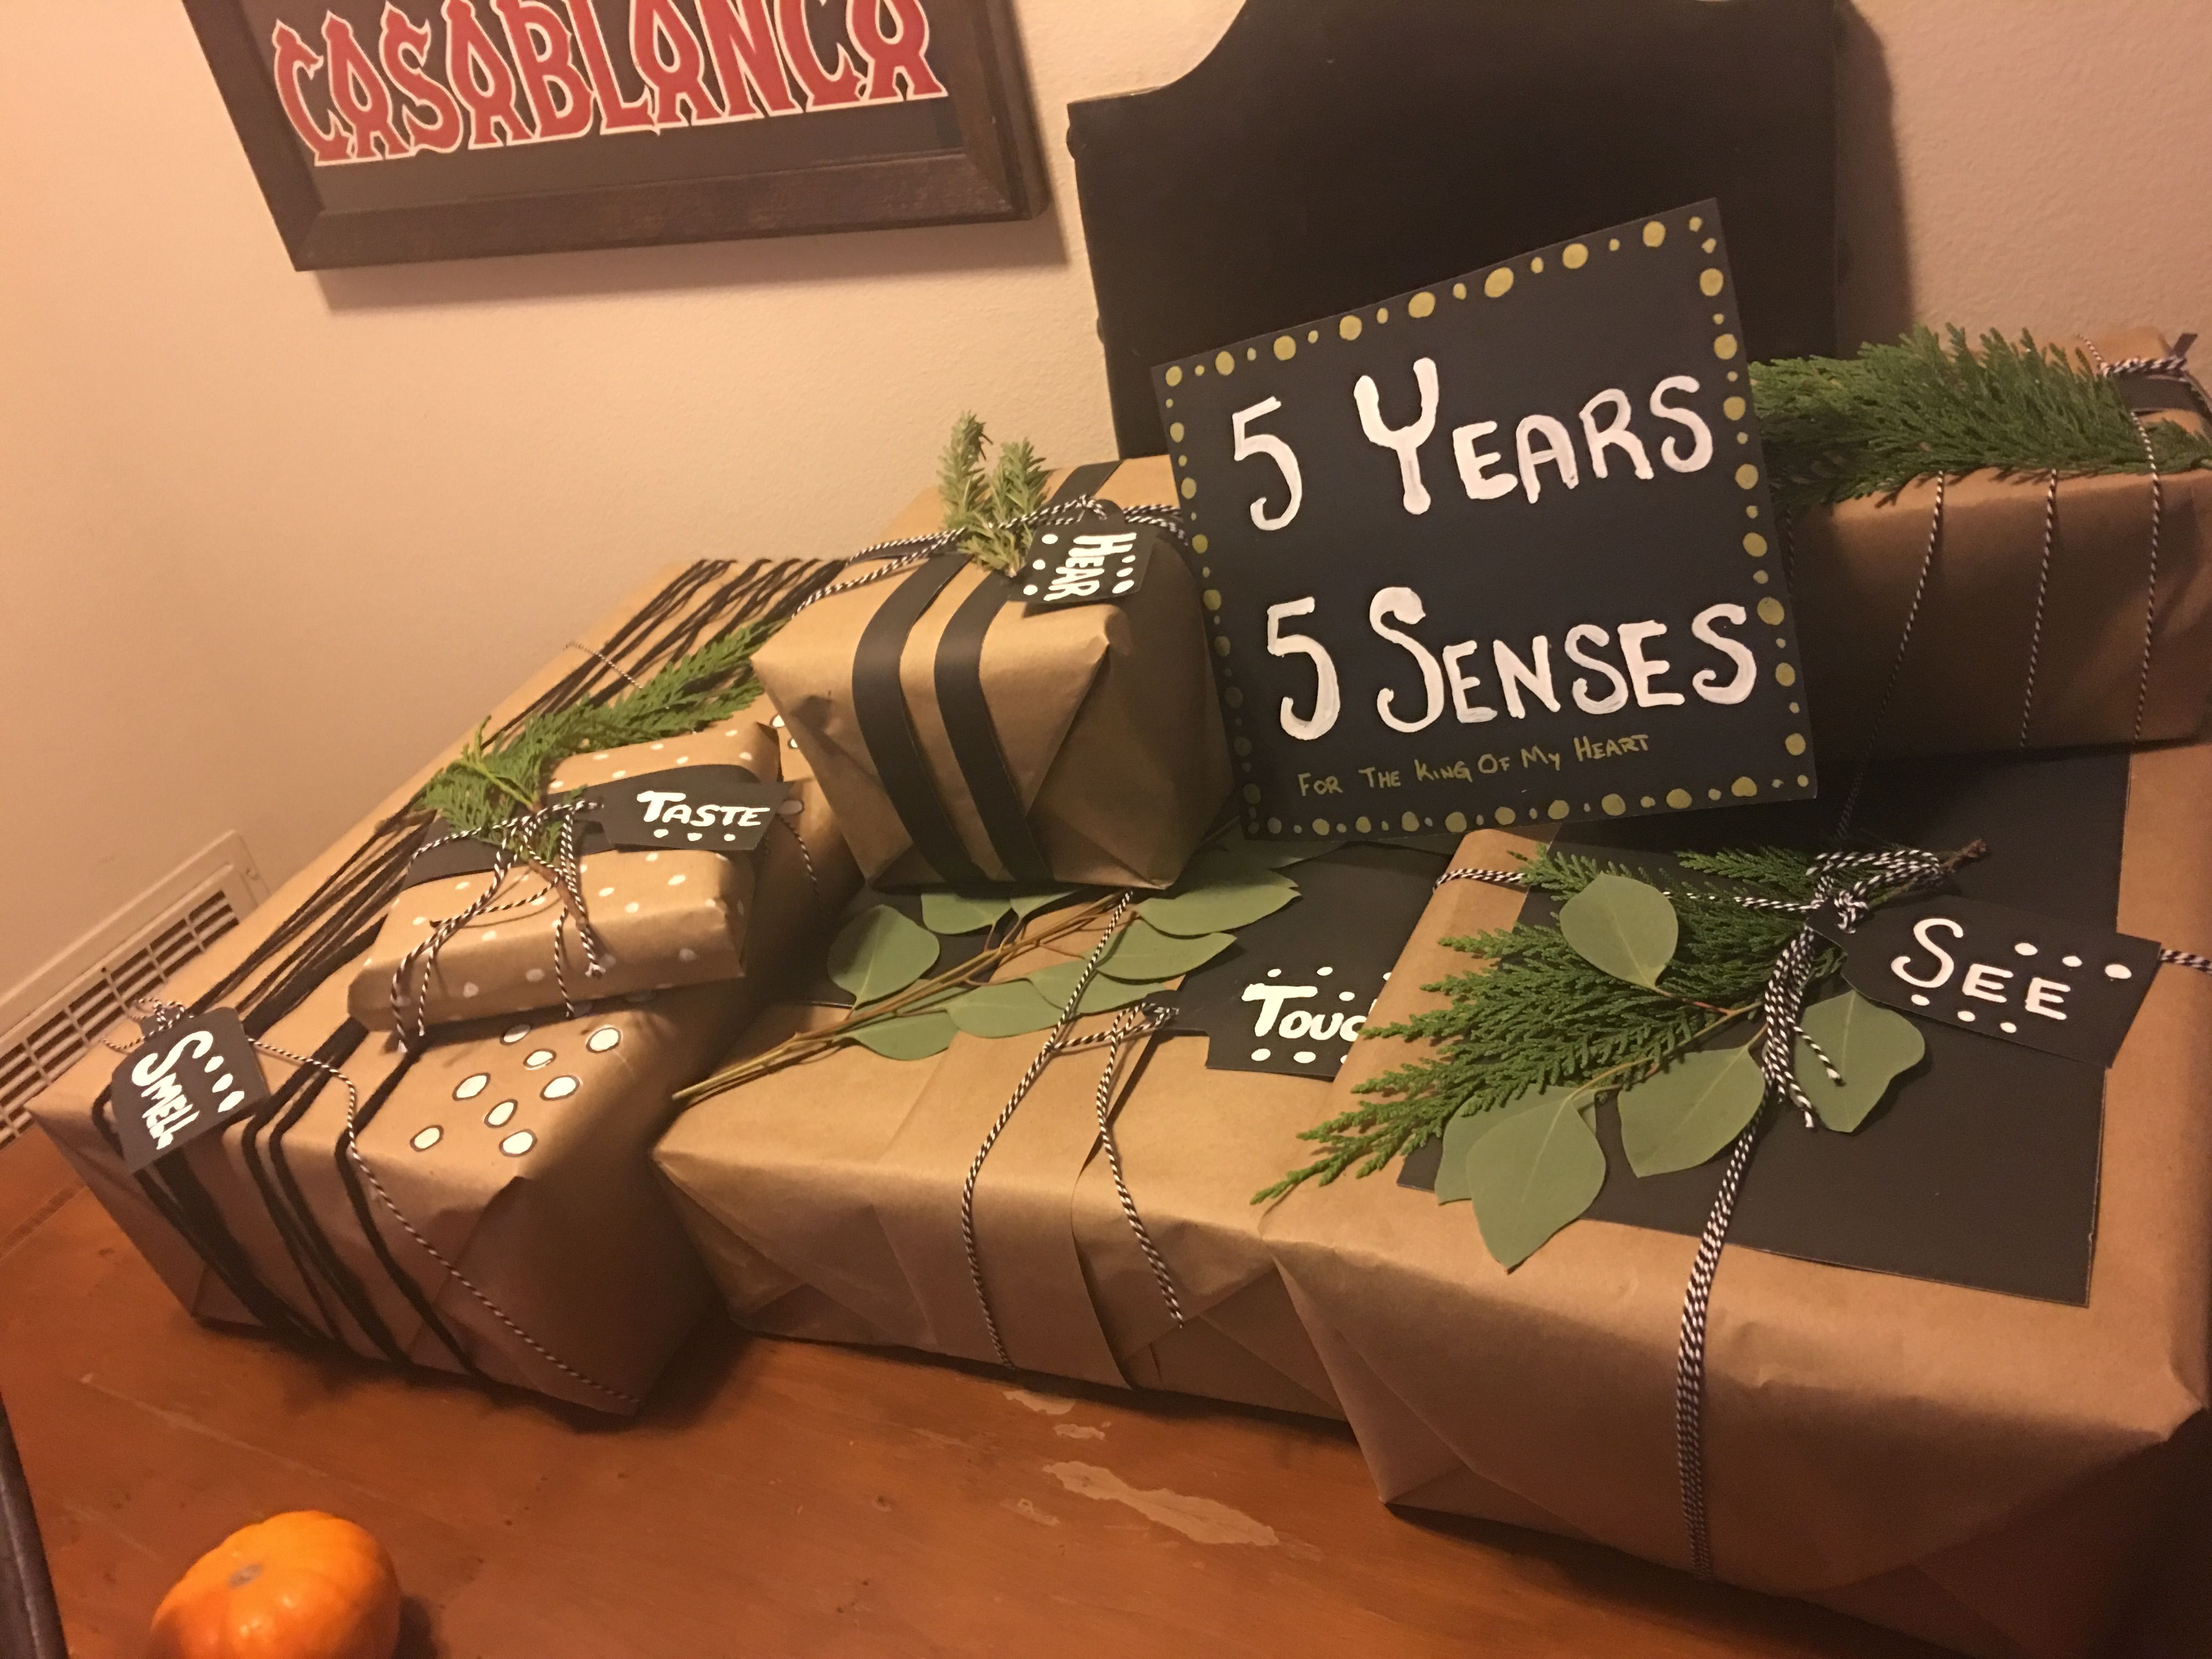 5 Senses Gift For Him. 5 Year Anniversary.